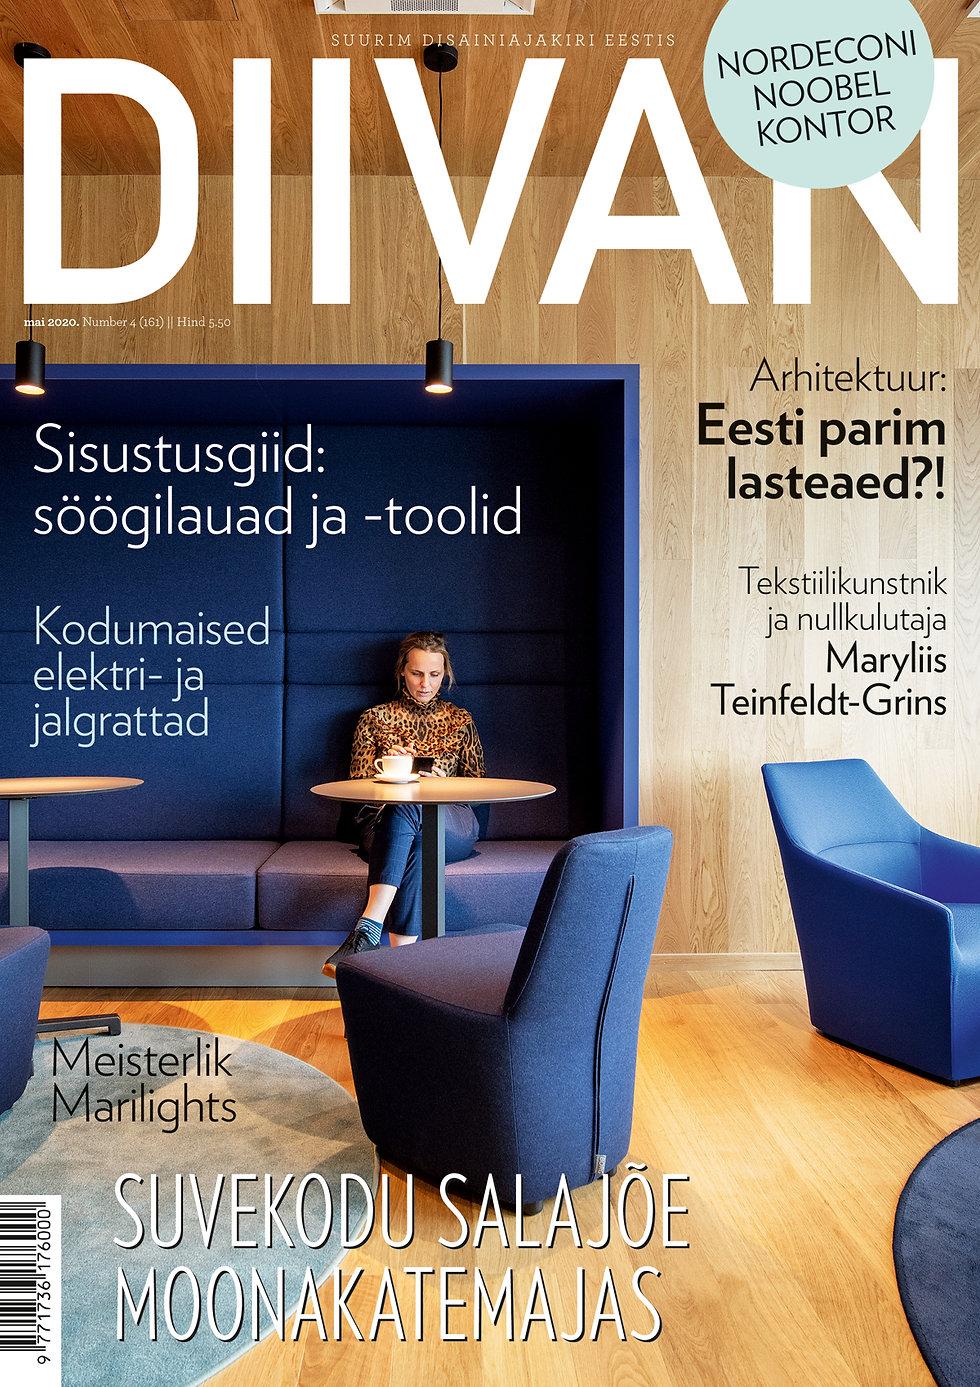 Magazine Diivan May 2020